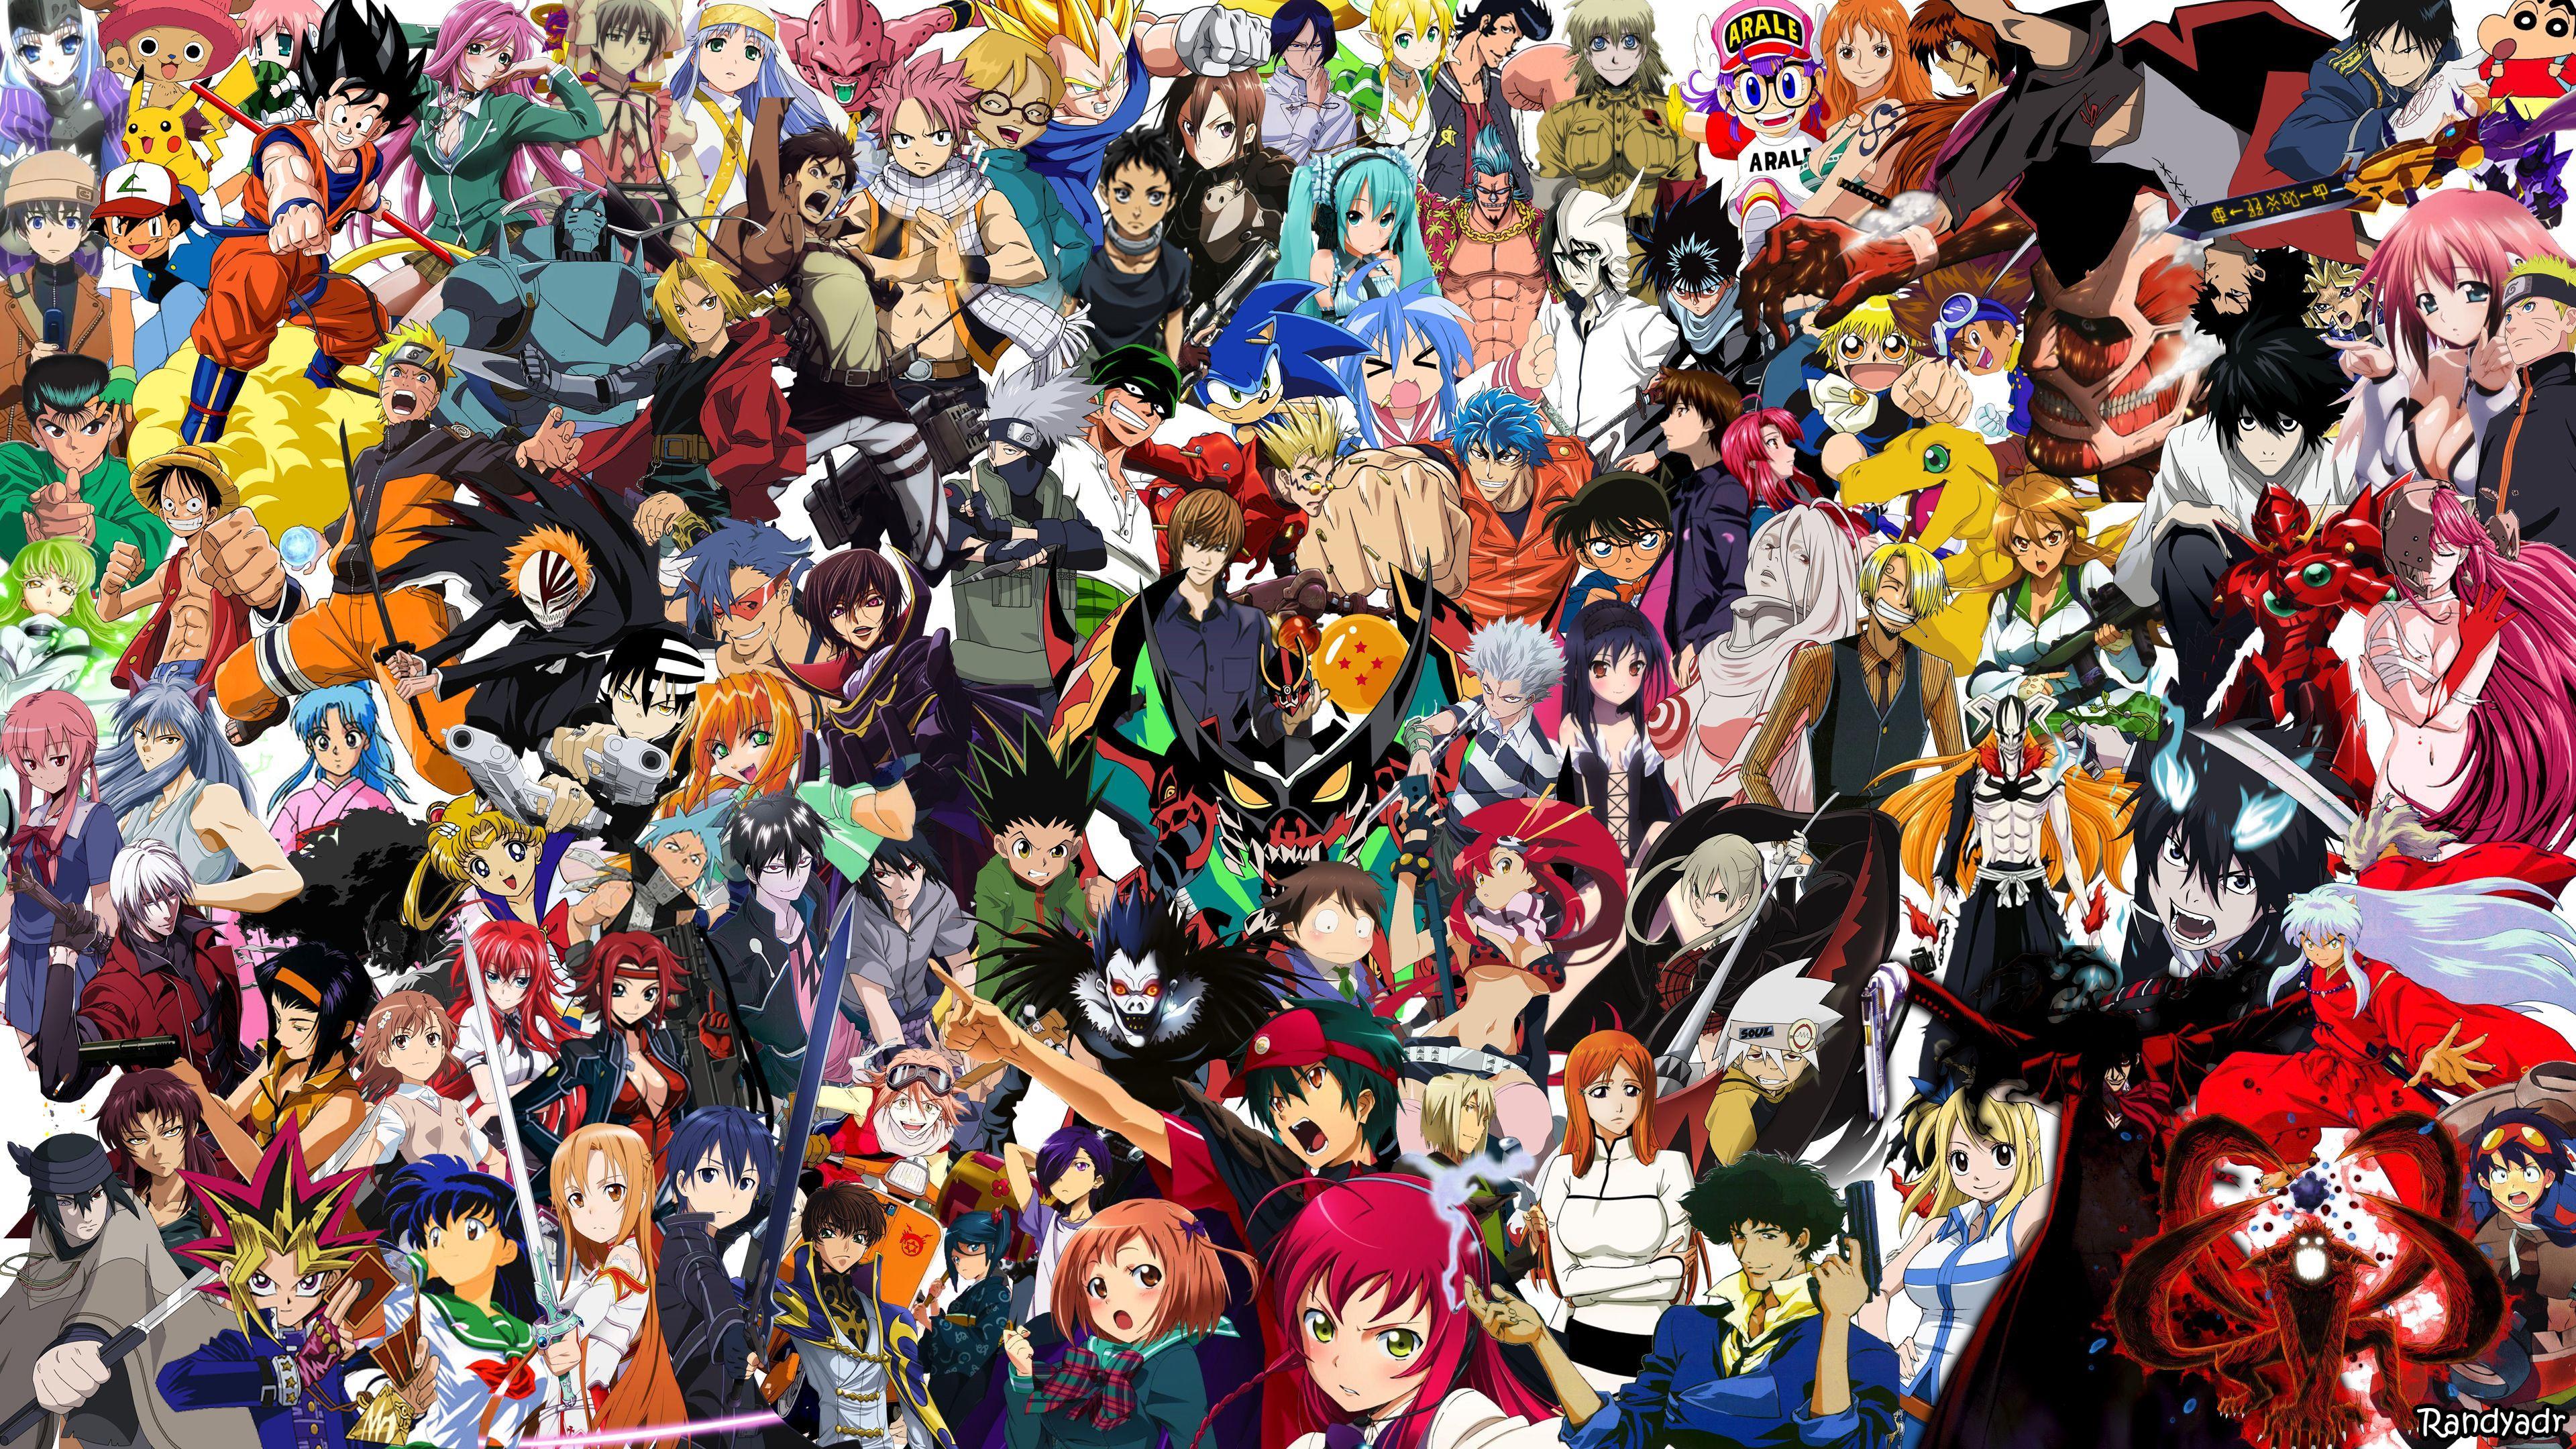 Wallpaper 4k All Anime Wallpaper Iphone